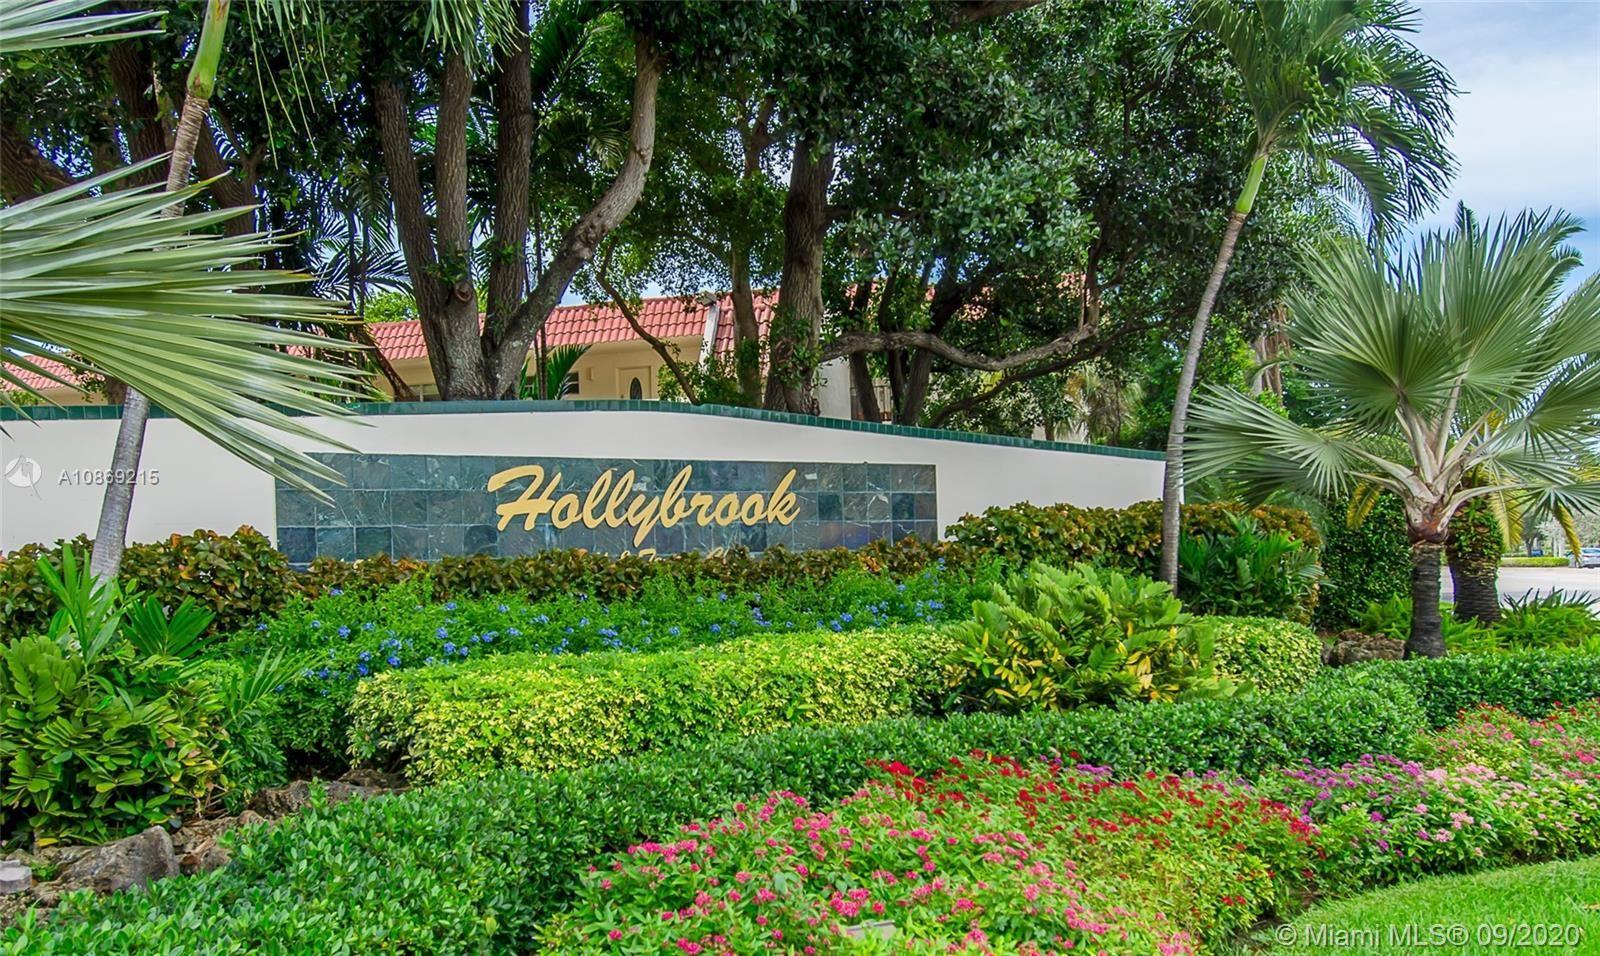 371 S Hollybrook Dr #202, Pembroke Pines, FL 33025 - #: A10869215